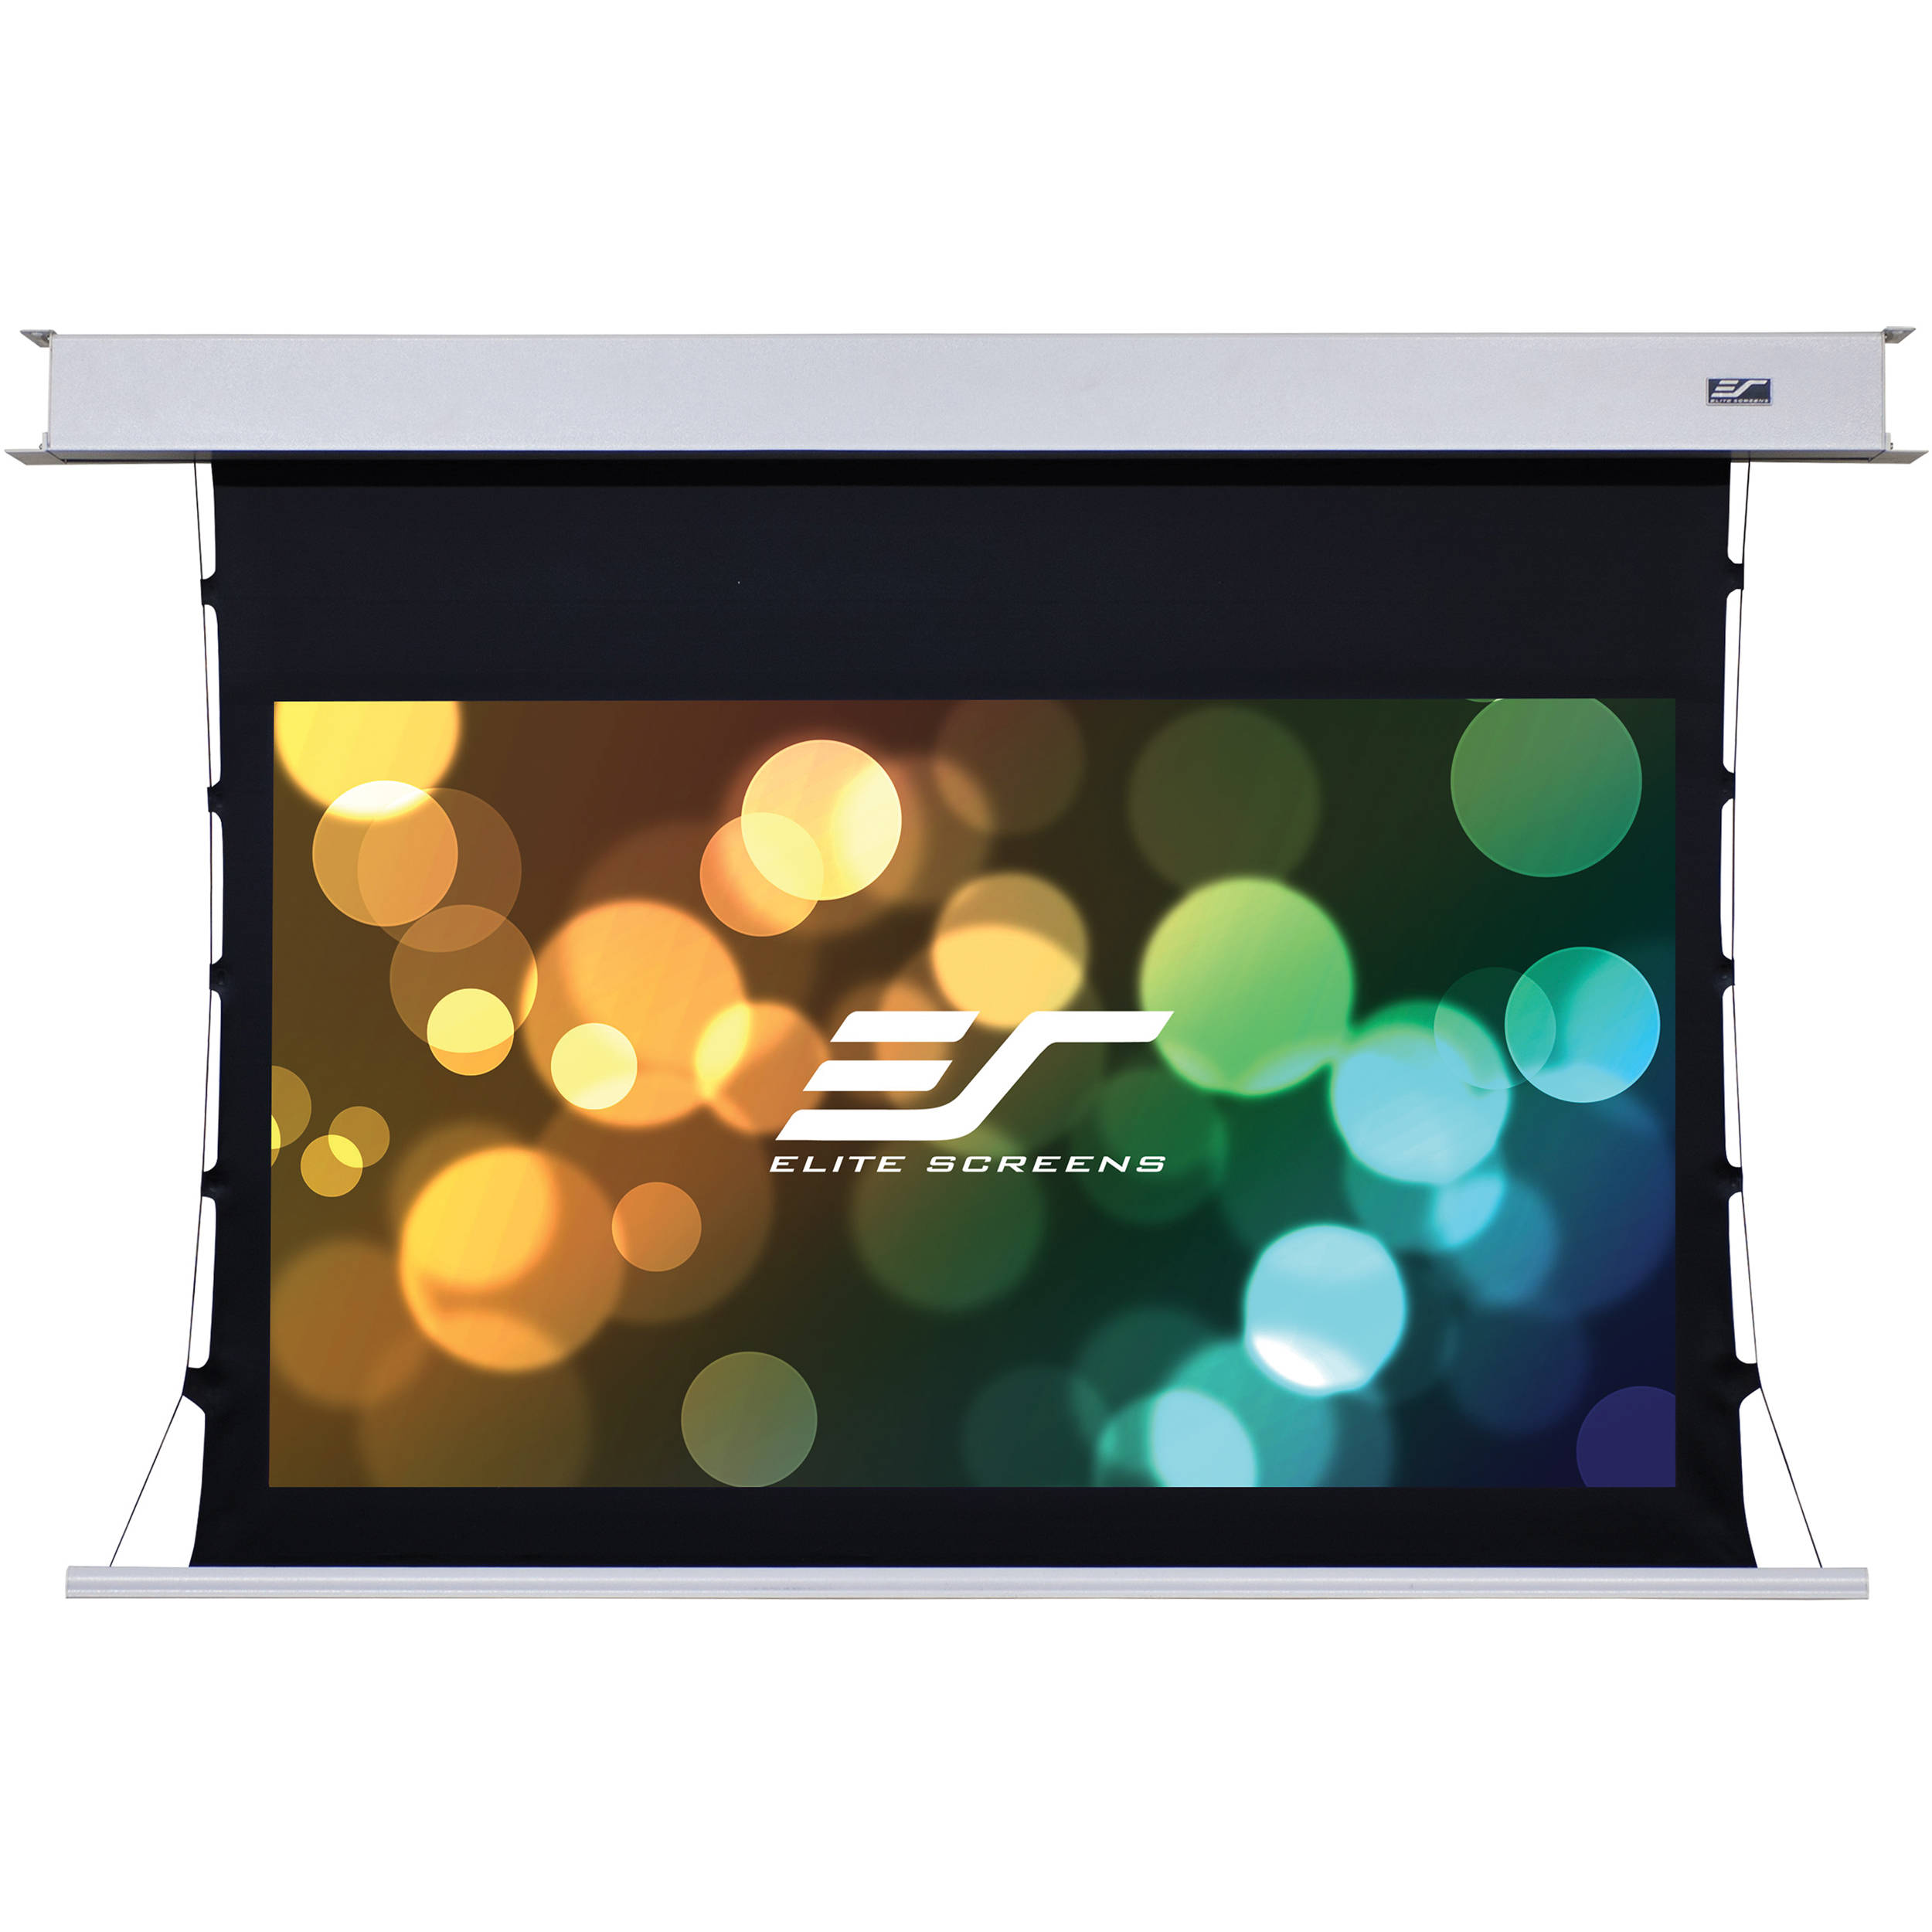 Elite screens evanesce tab tension b etb120hw2 e8 etb120hw2 e8 for Tab tensioned motorized projection screen